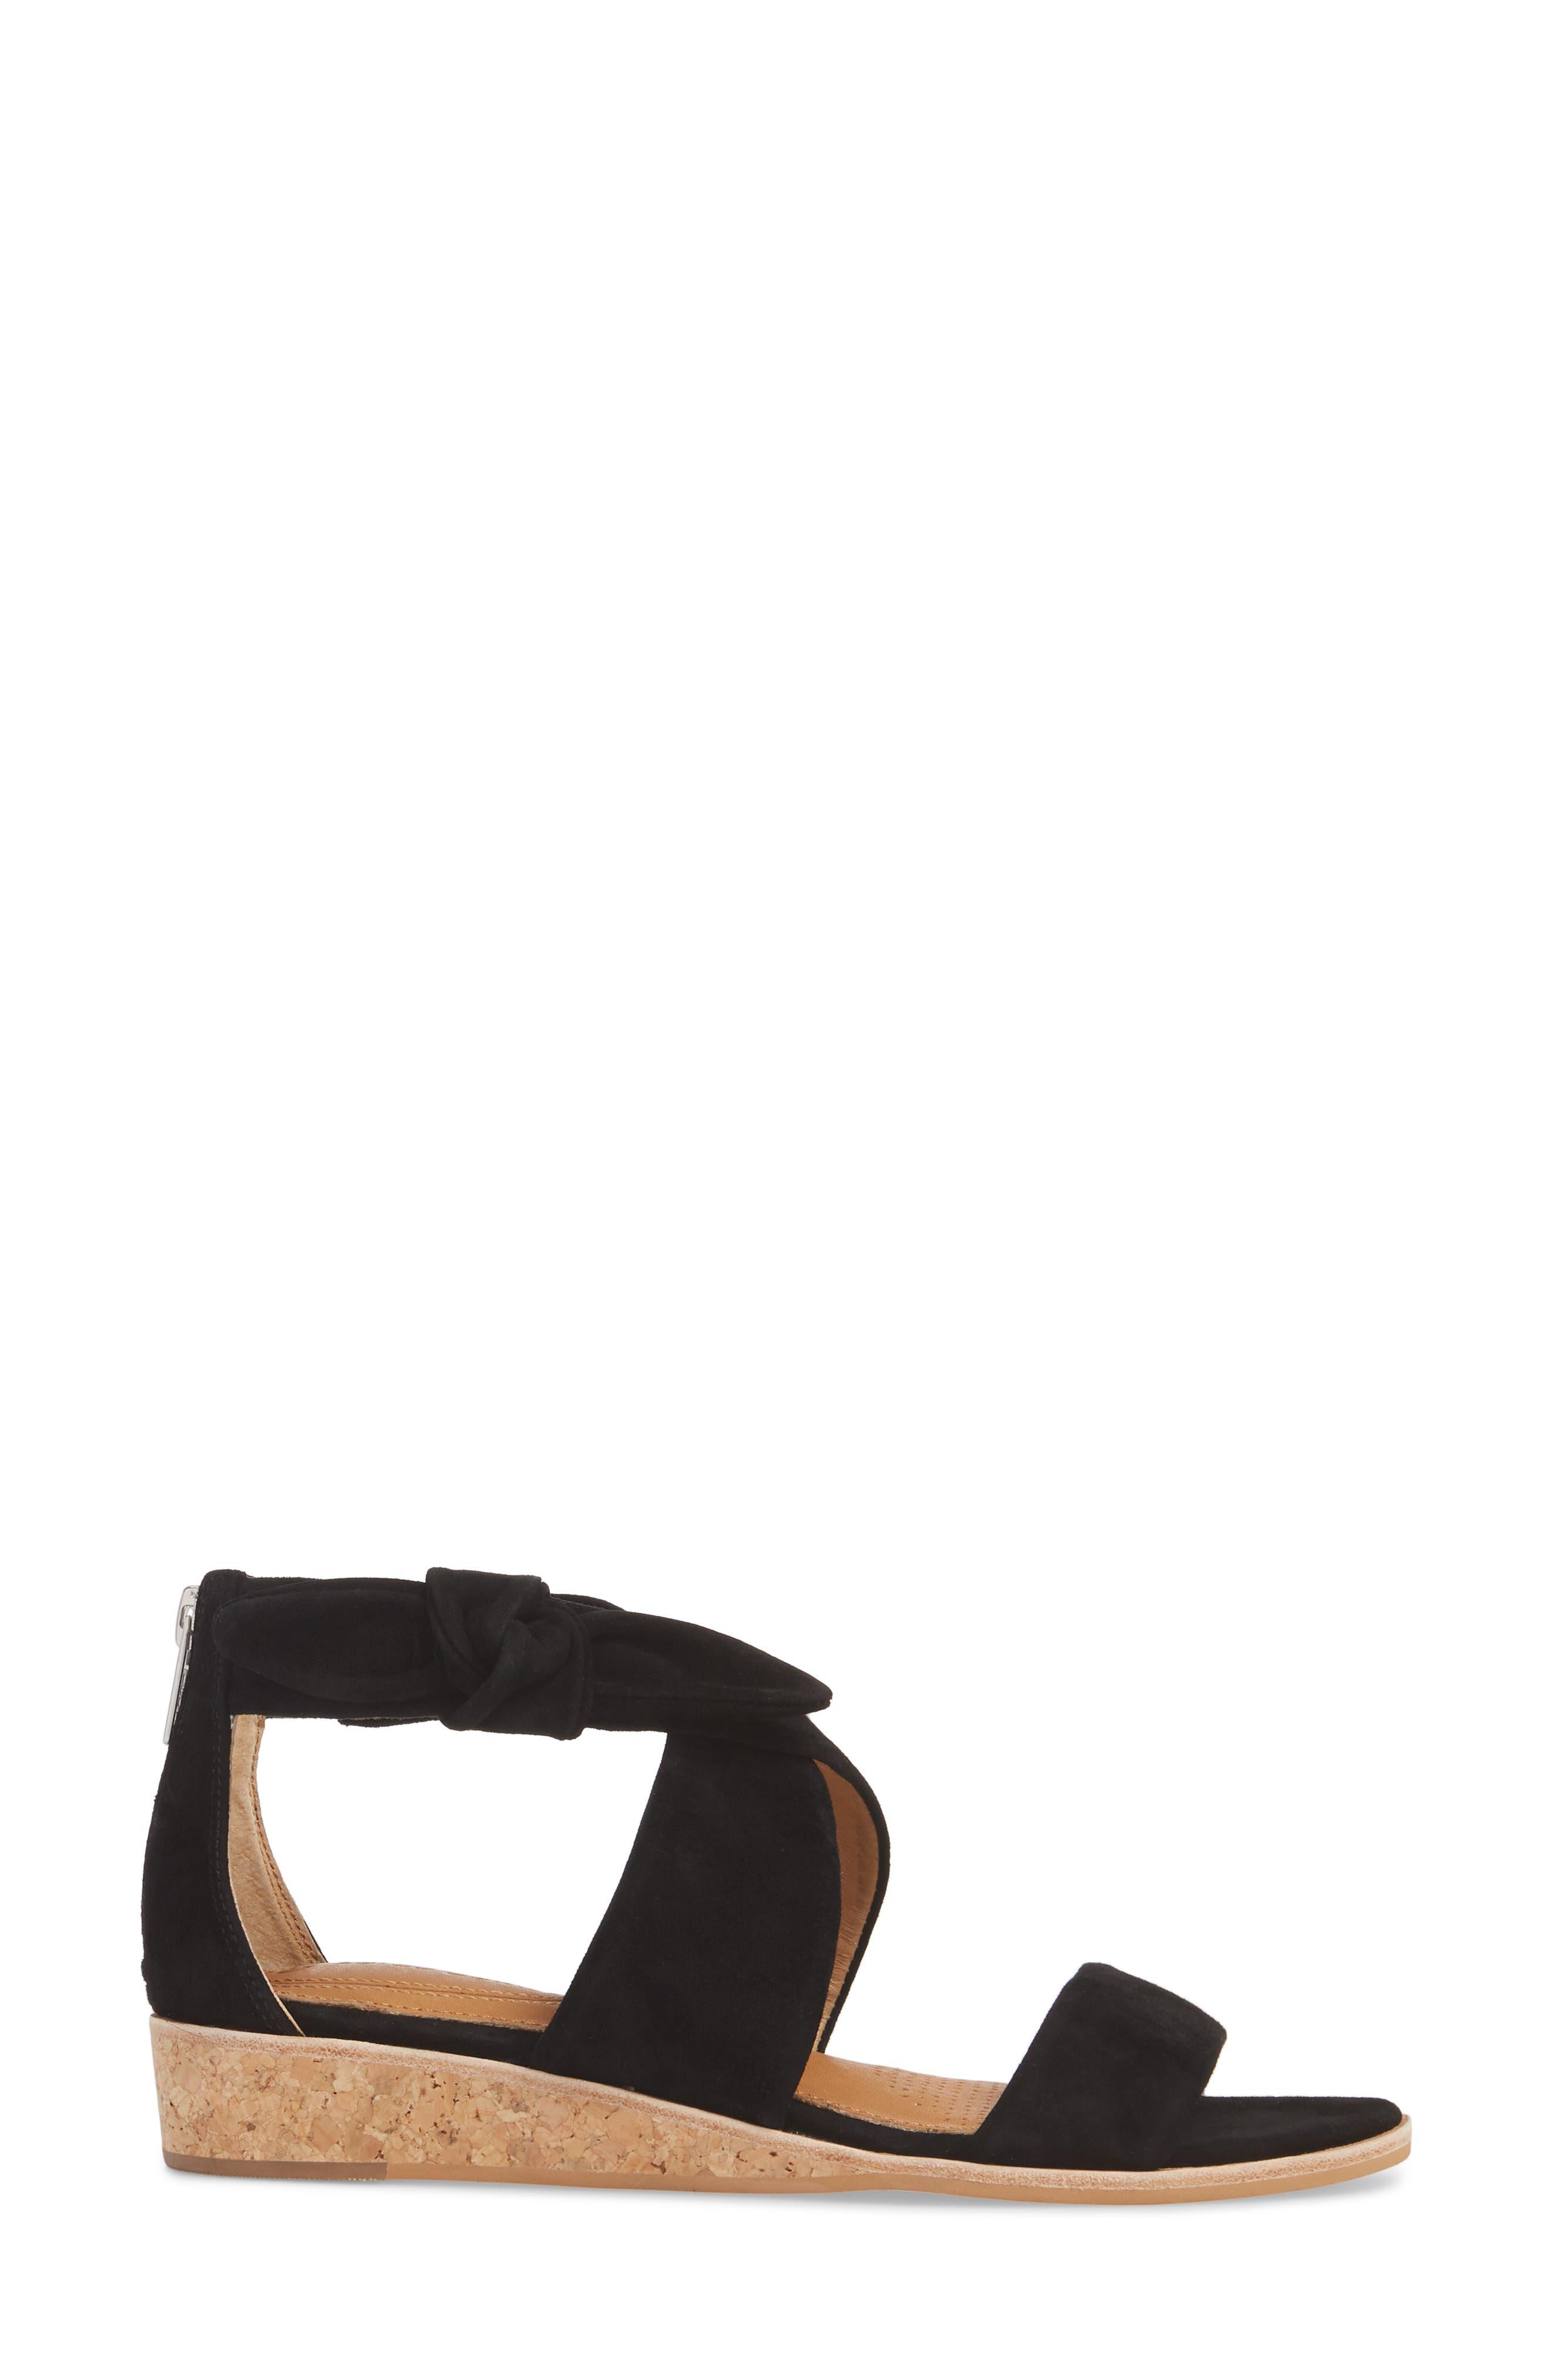 Rasque Sandal,                             Alternate thumbnail 3, color,                             BLACK LEATHER